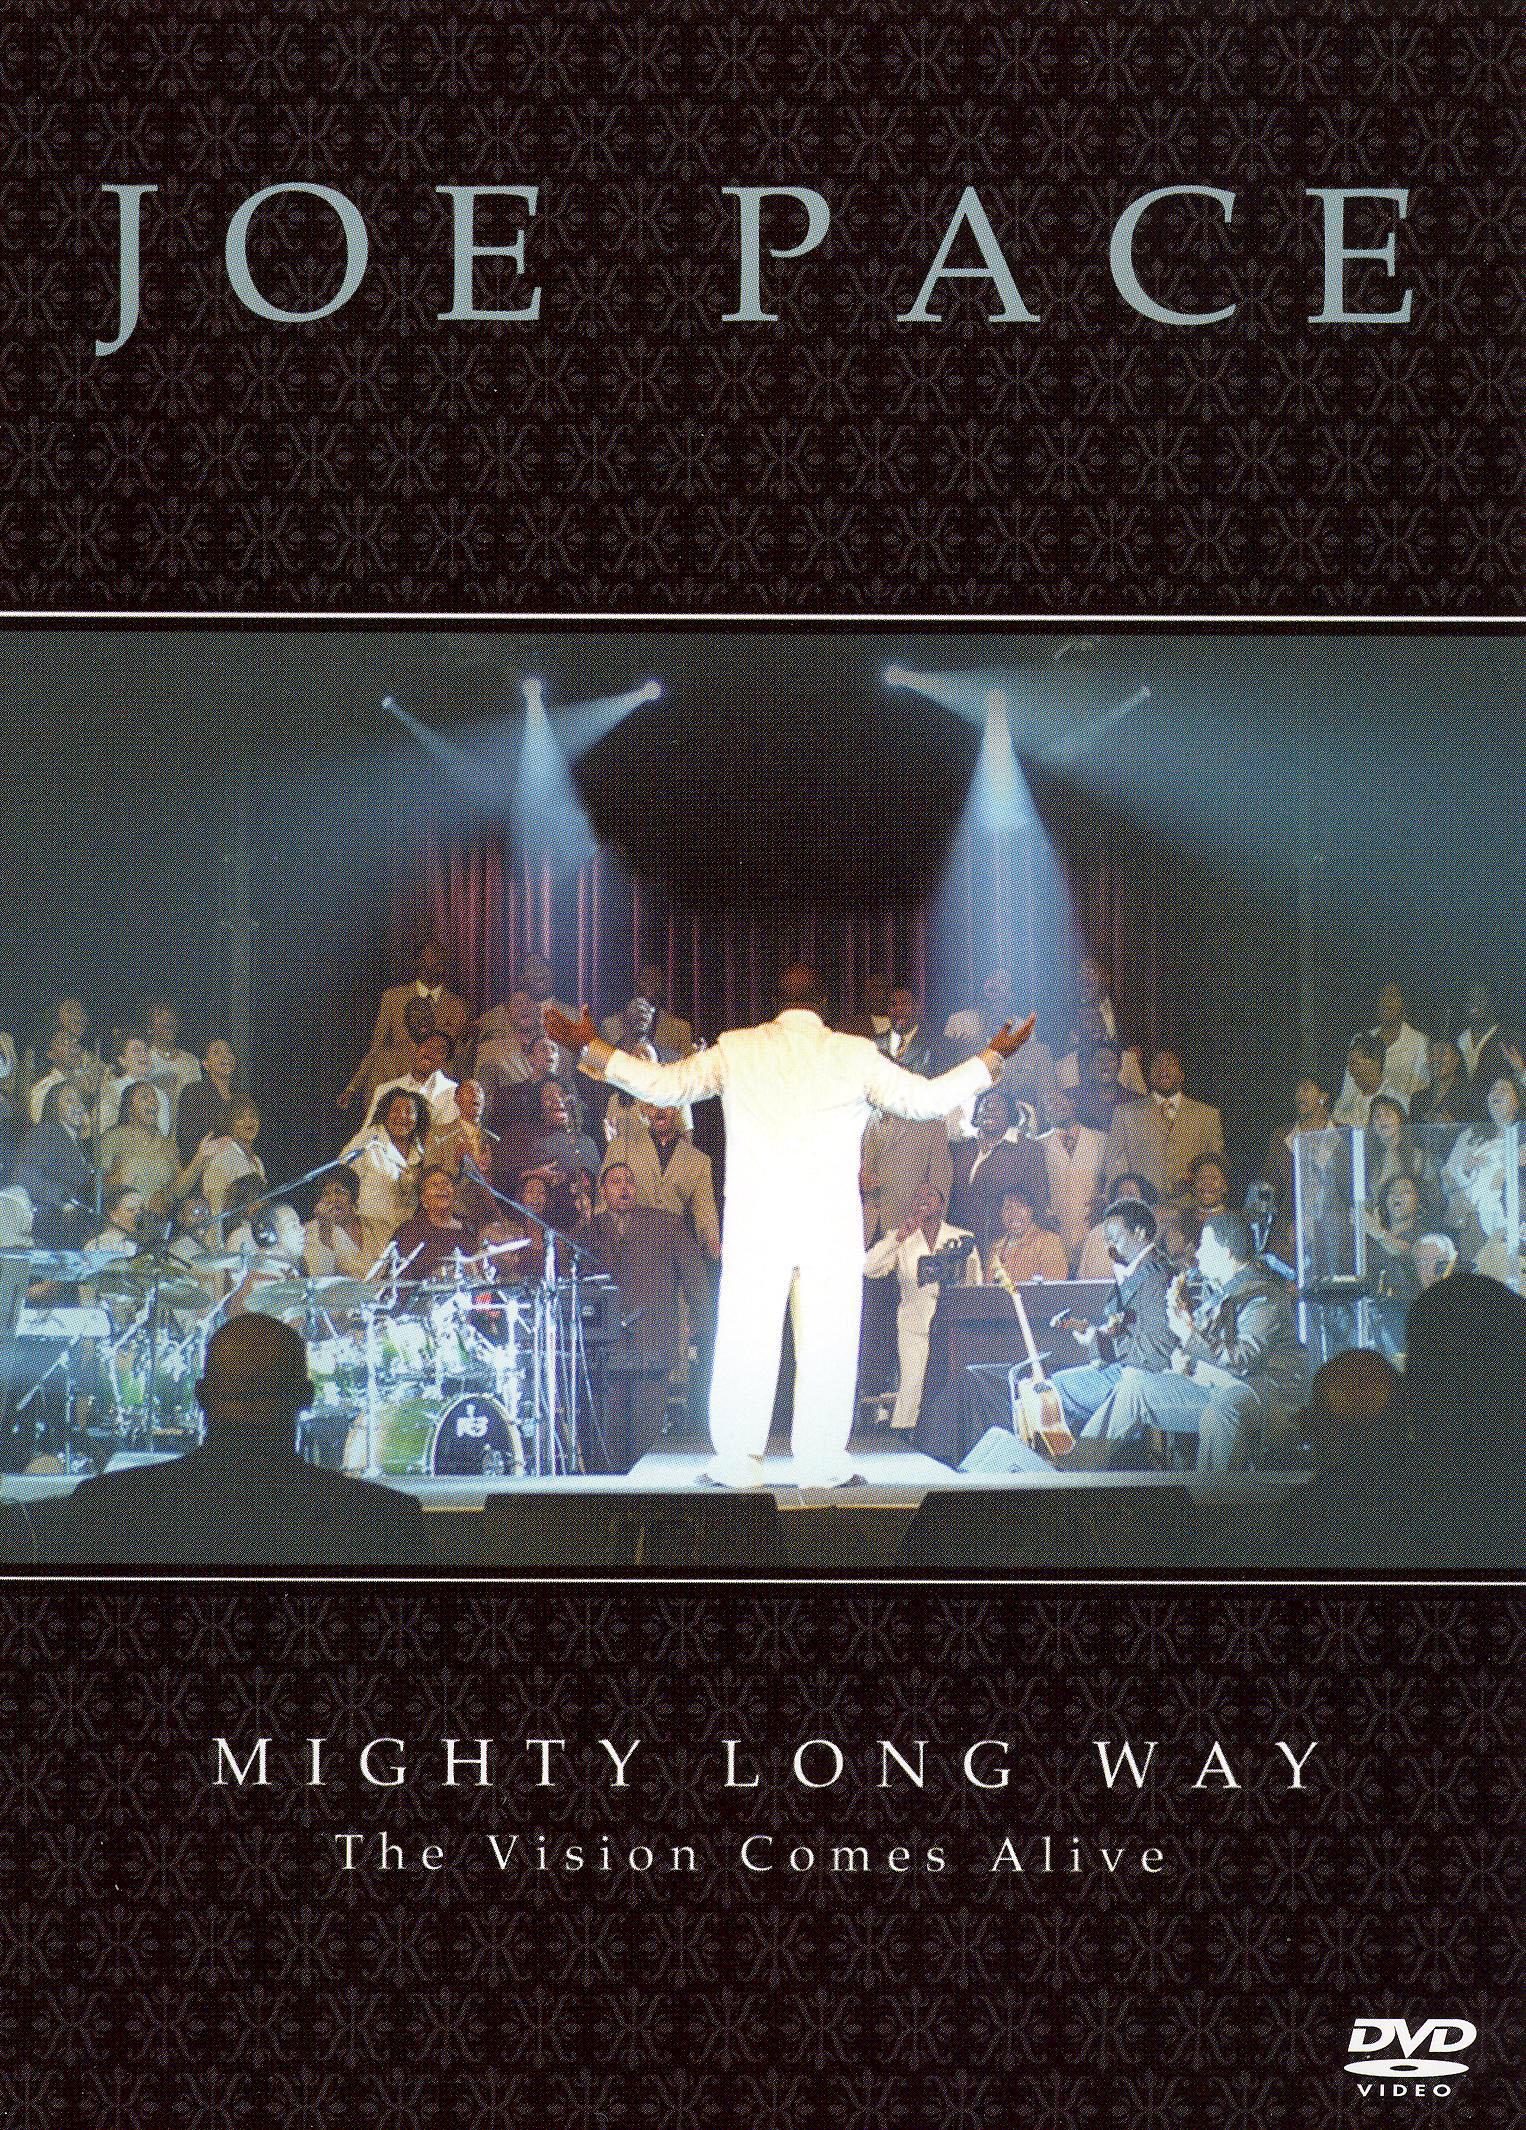 Joe Pace: Mighty Long Way